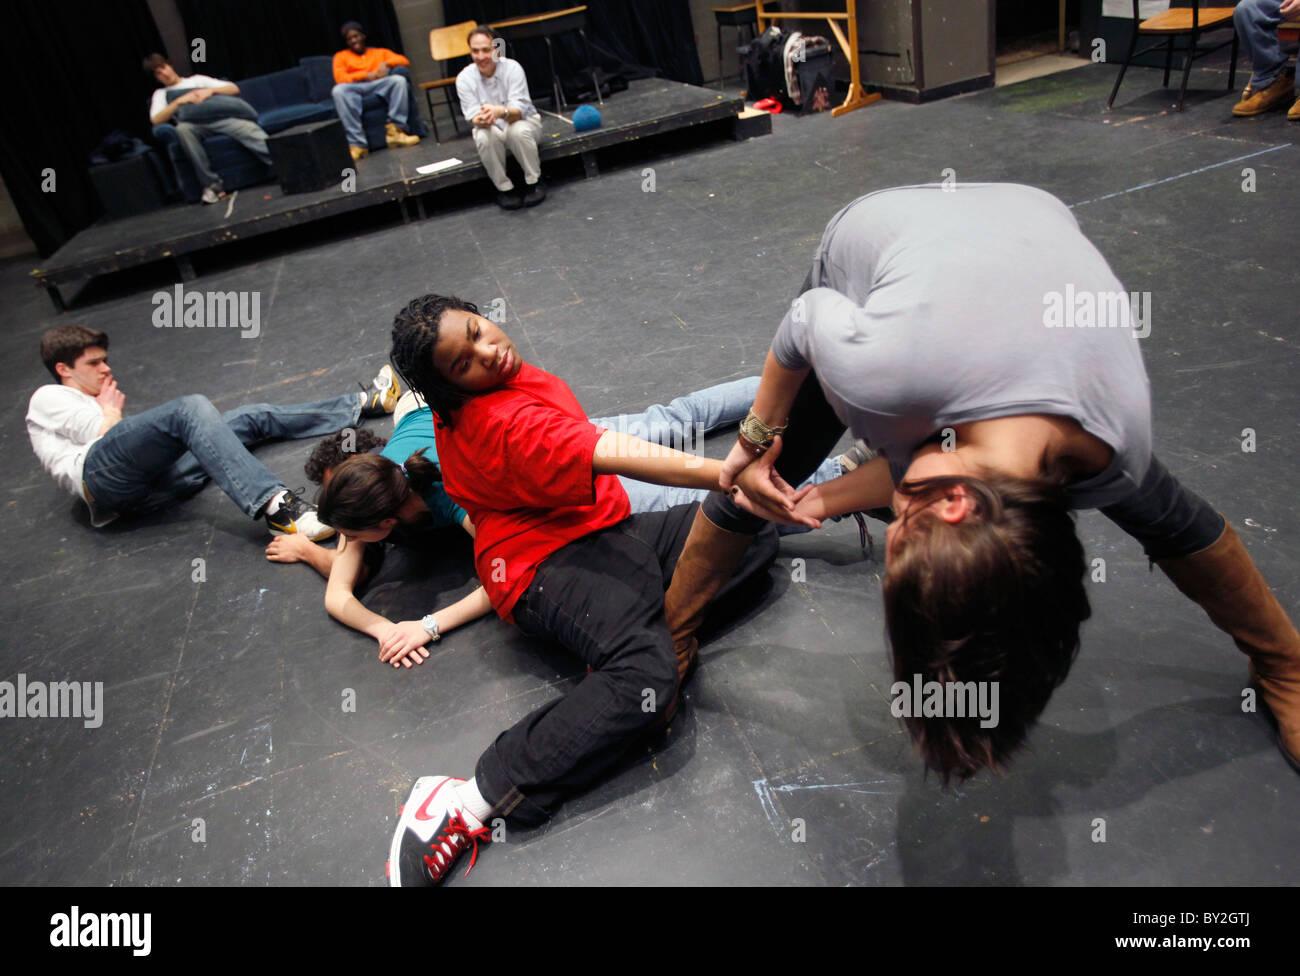 American high school theater class - Stock Image